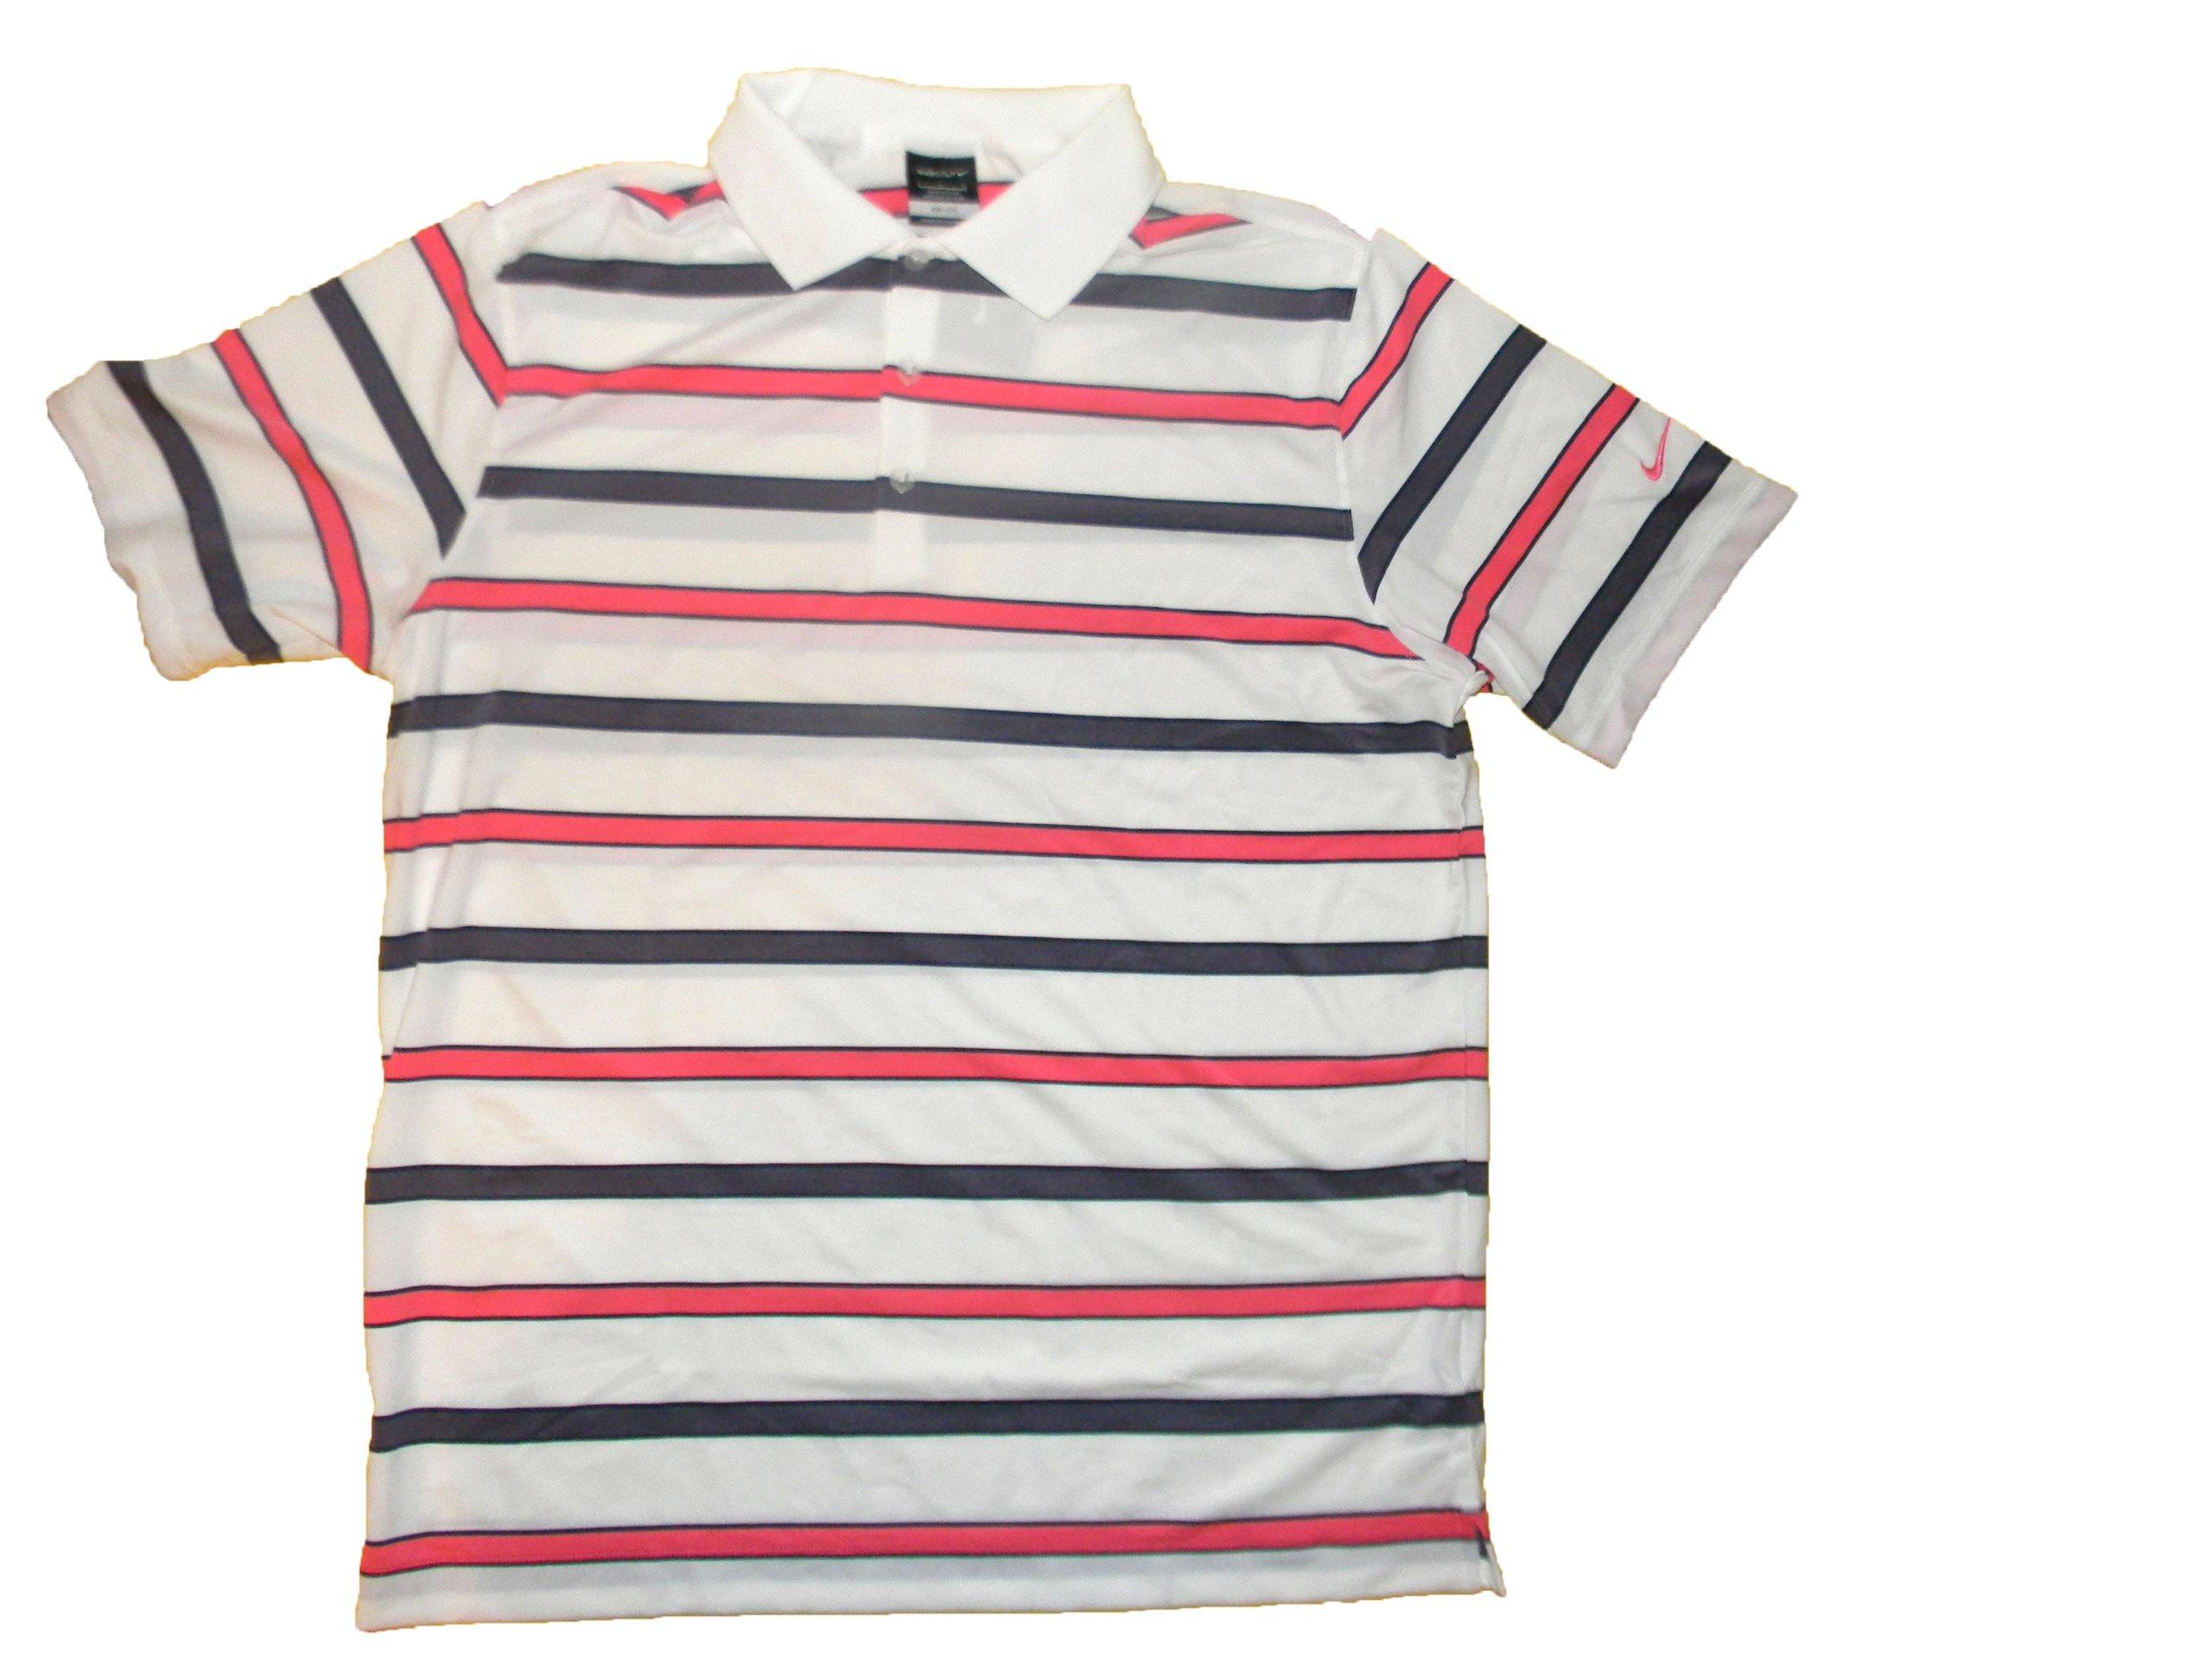 b9e290aed Buy Nike Dri Fit Uv Stripe Men Polo Golf Shirt 597253-100 Large ...